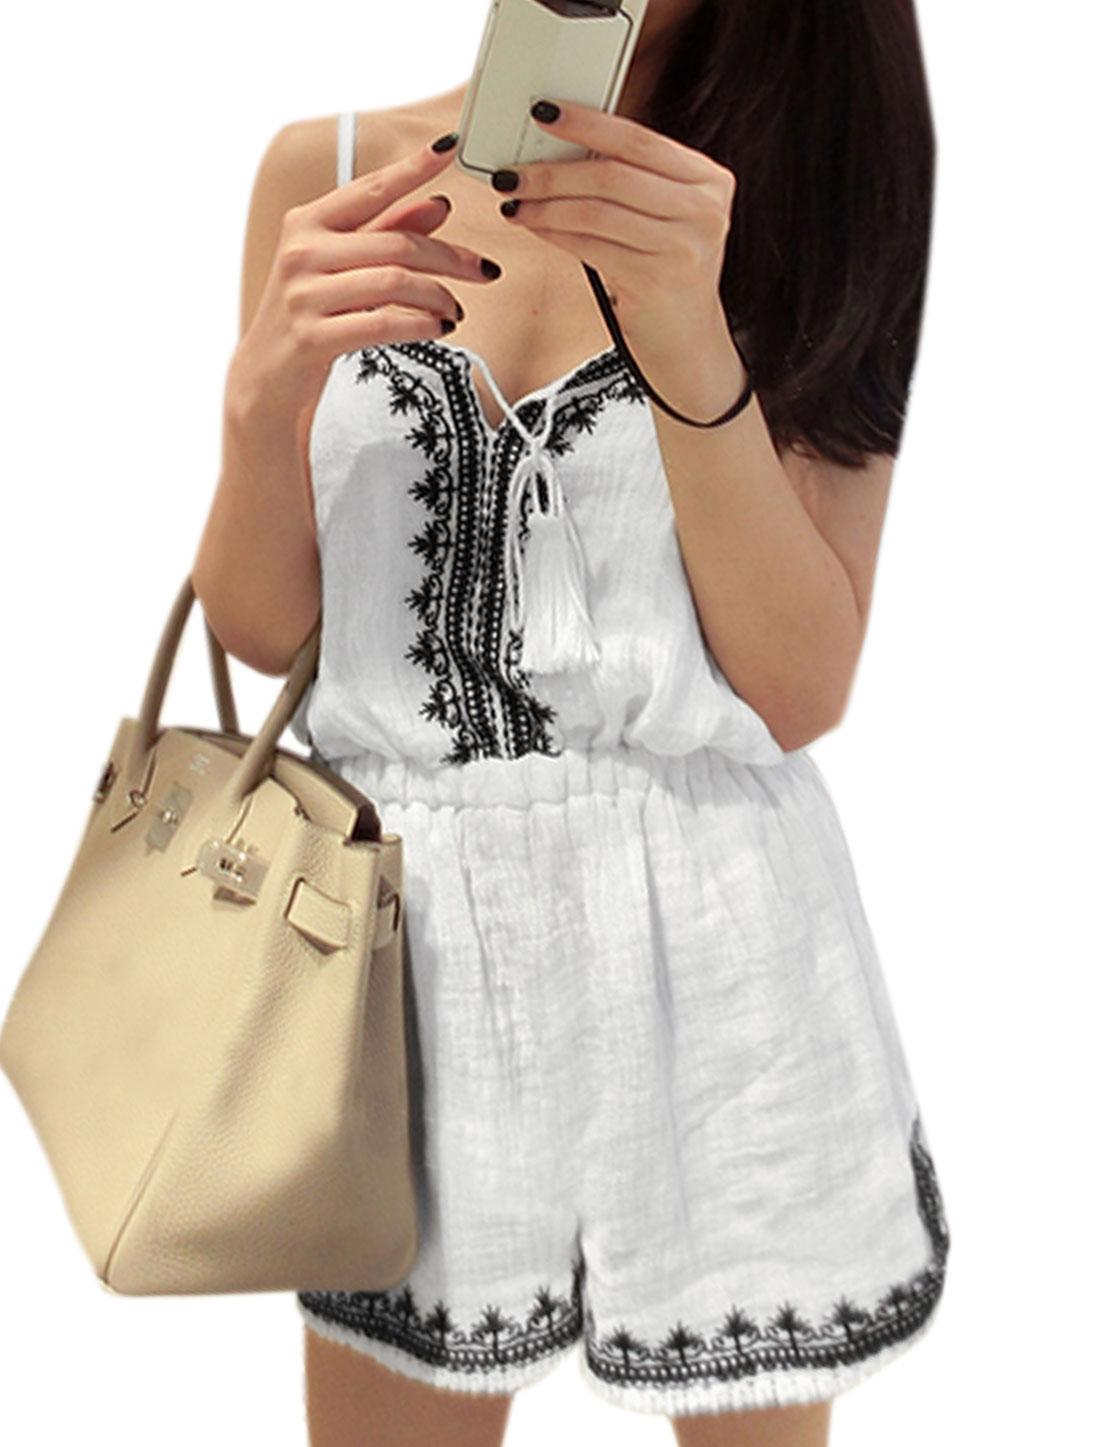 Women Novelty Embroidery Sleeveless Spaghetti Straps Romper White XS